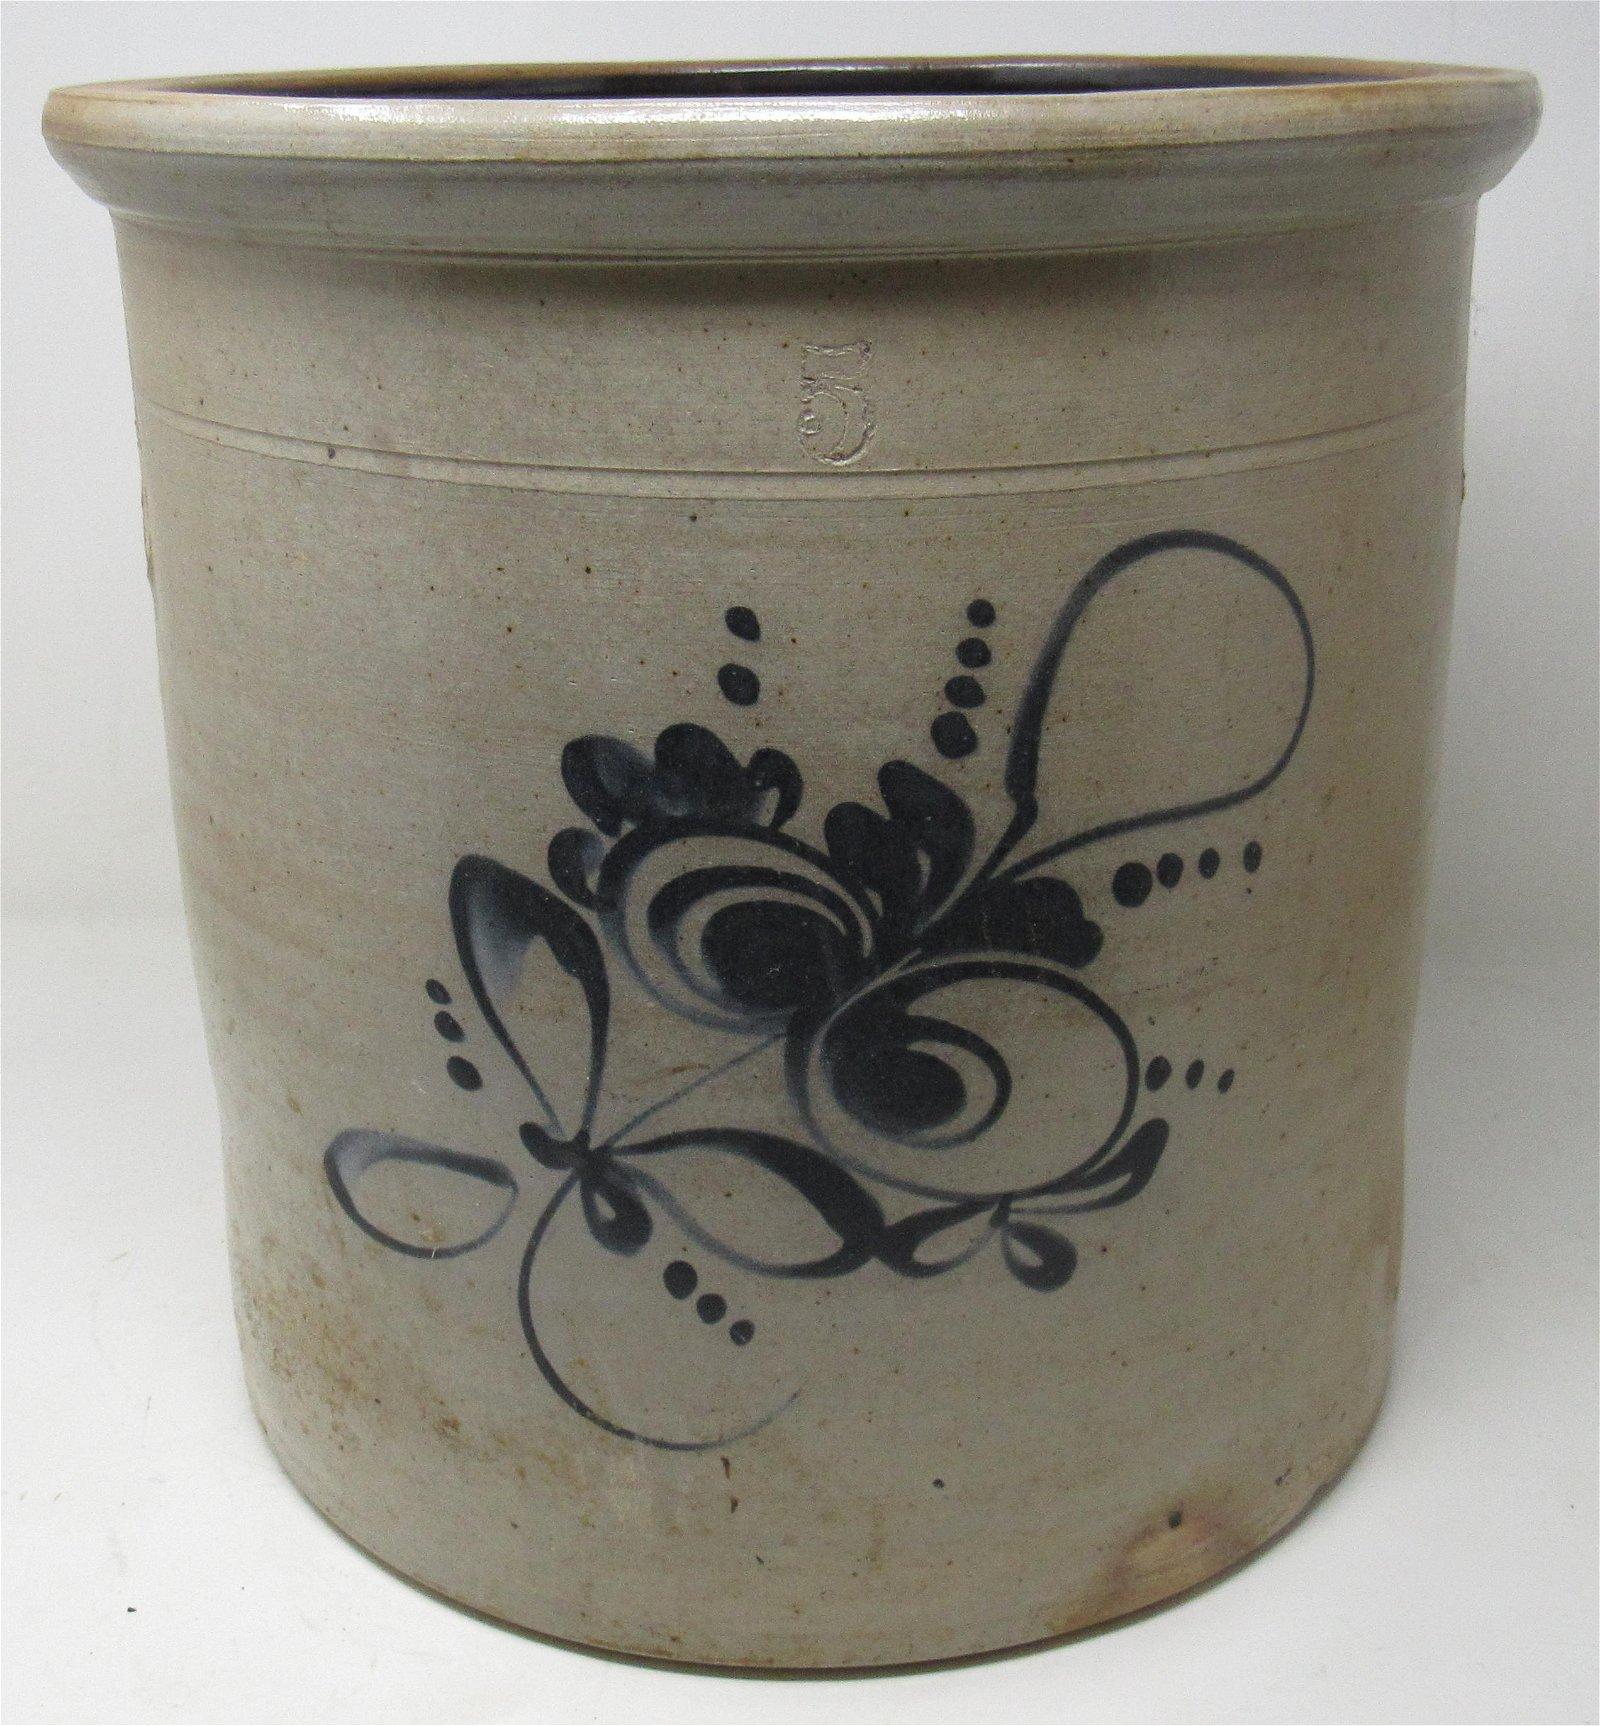 5 Gallon Blue Decorated Stoneware Crock